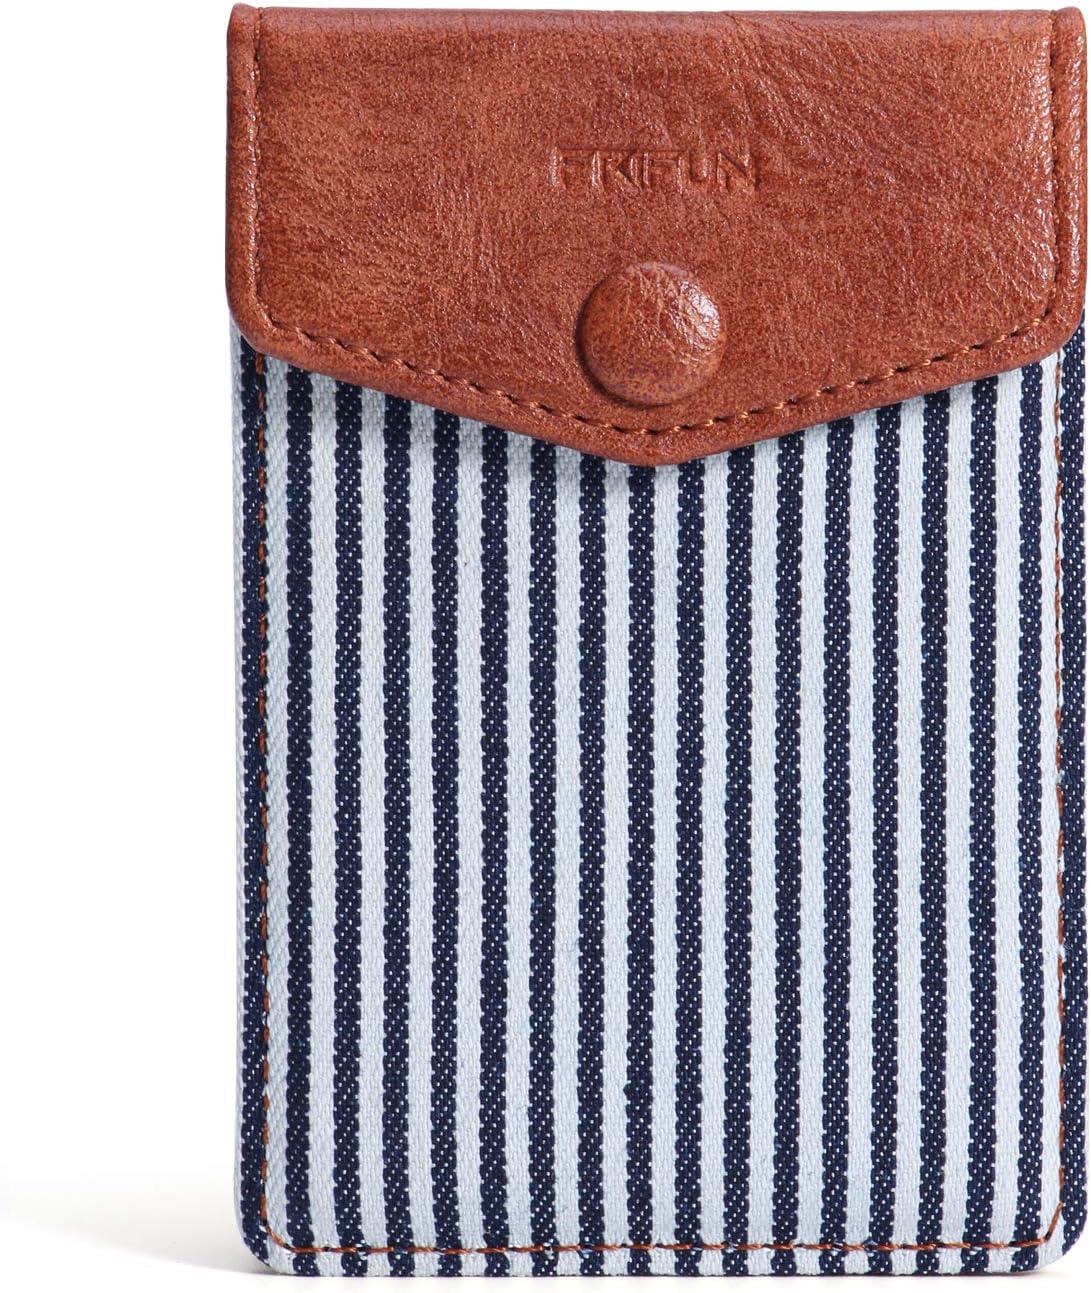 FRIFUN Card Holder for Back of Ultra-Slim with Self Award Choice snap Phone A